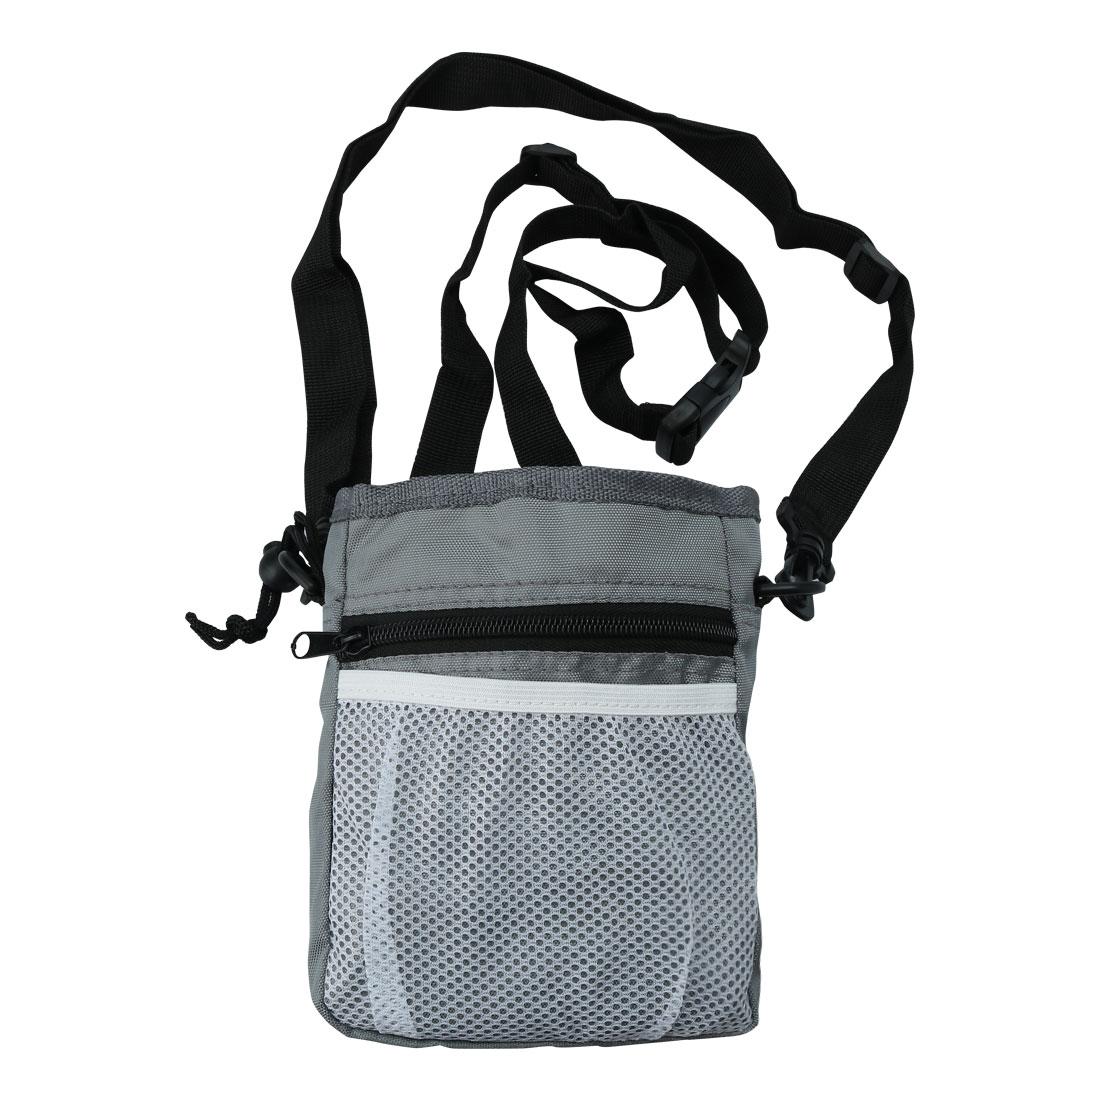 Dog Treat Training Bag Easily Carry Pets Holder Adjustable Waist Bag Orange